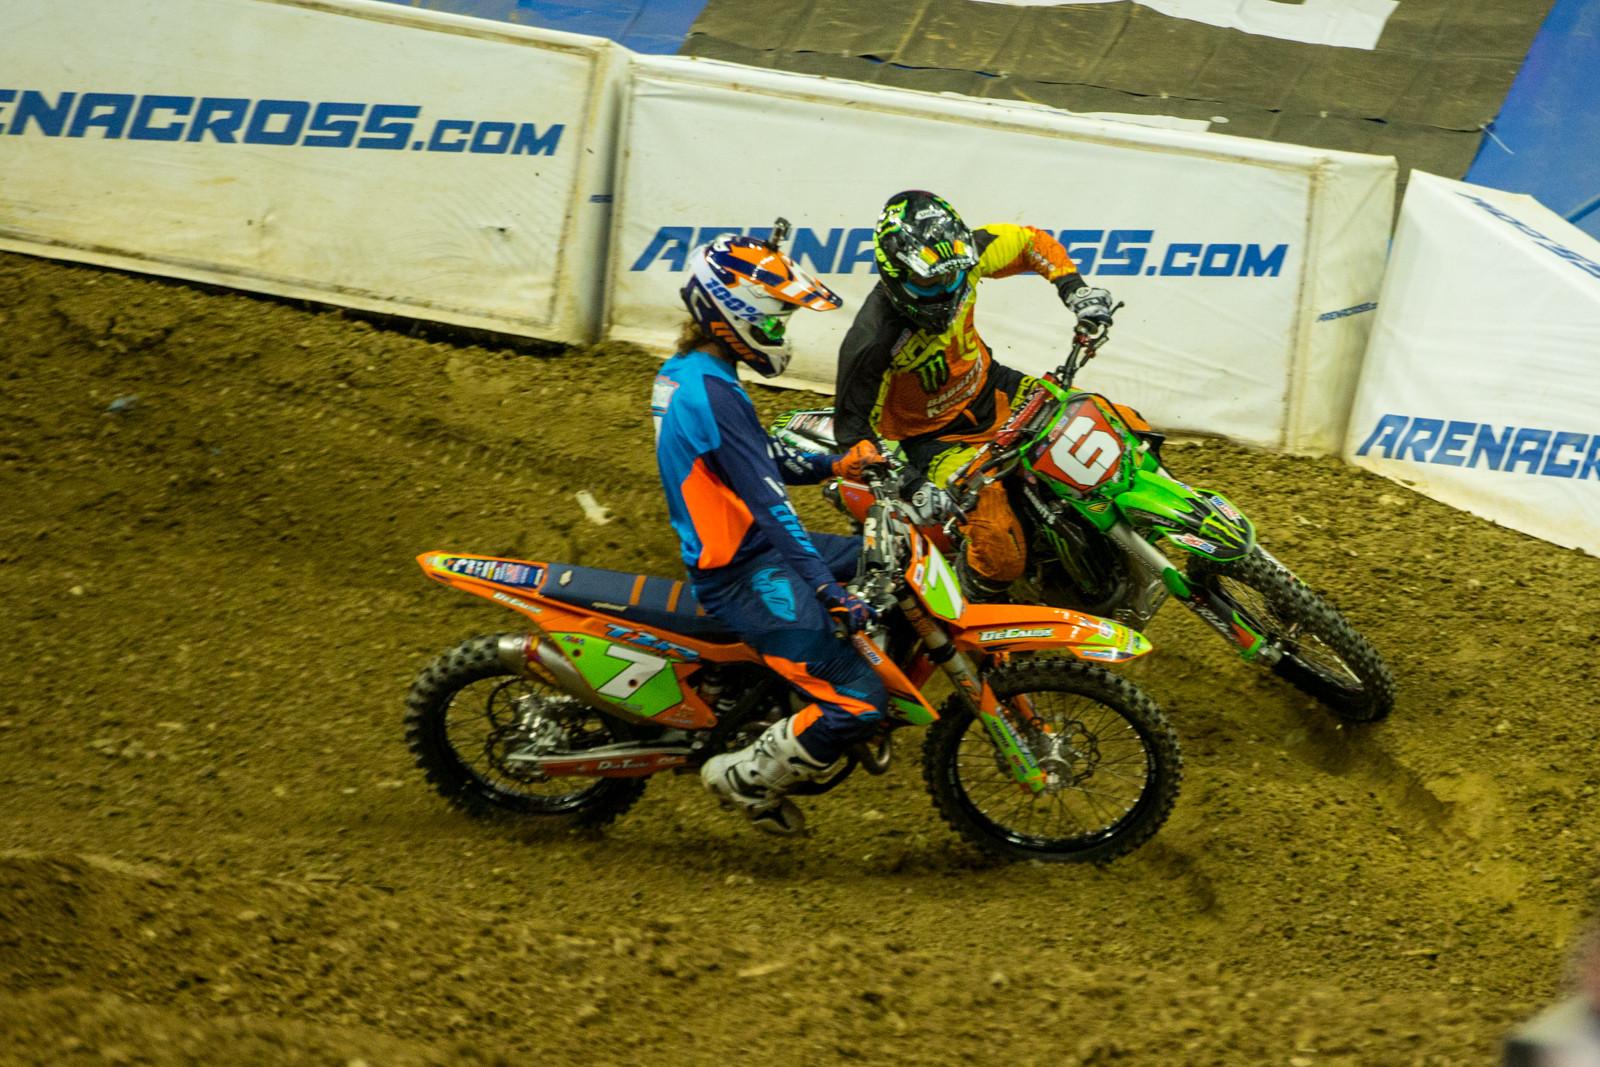 Head-to-Head Bracket Race - Photo Gallery: Ontario Arenacross - Saturday Night - Motocross Pictures - Vital MX